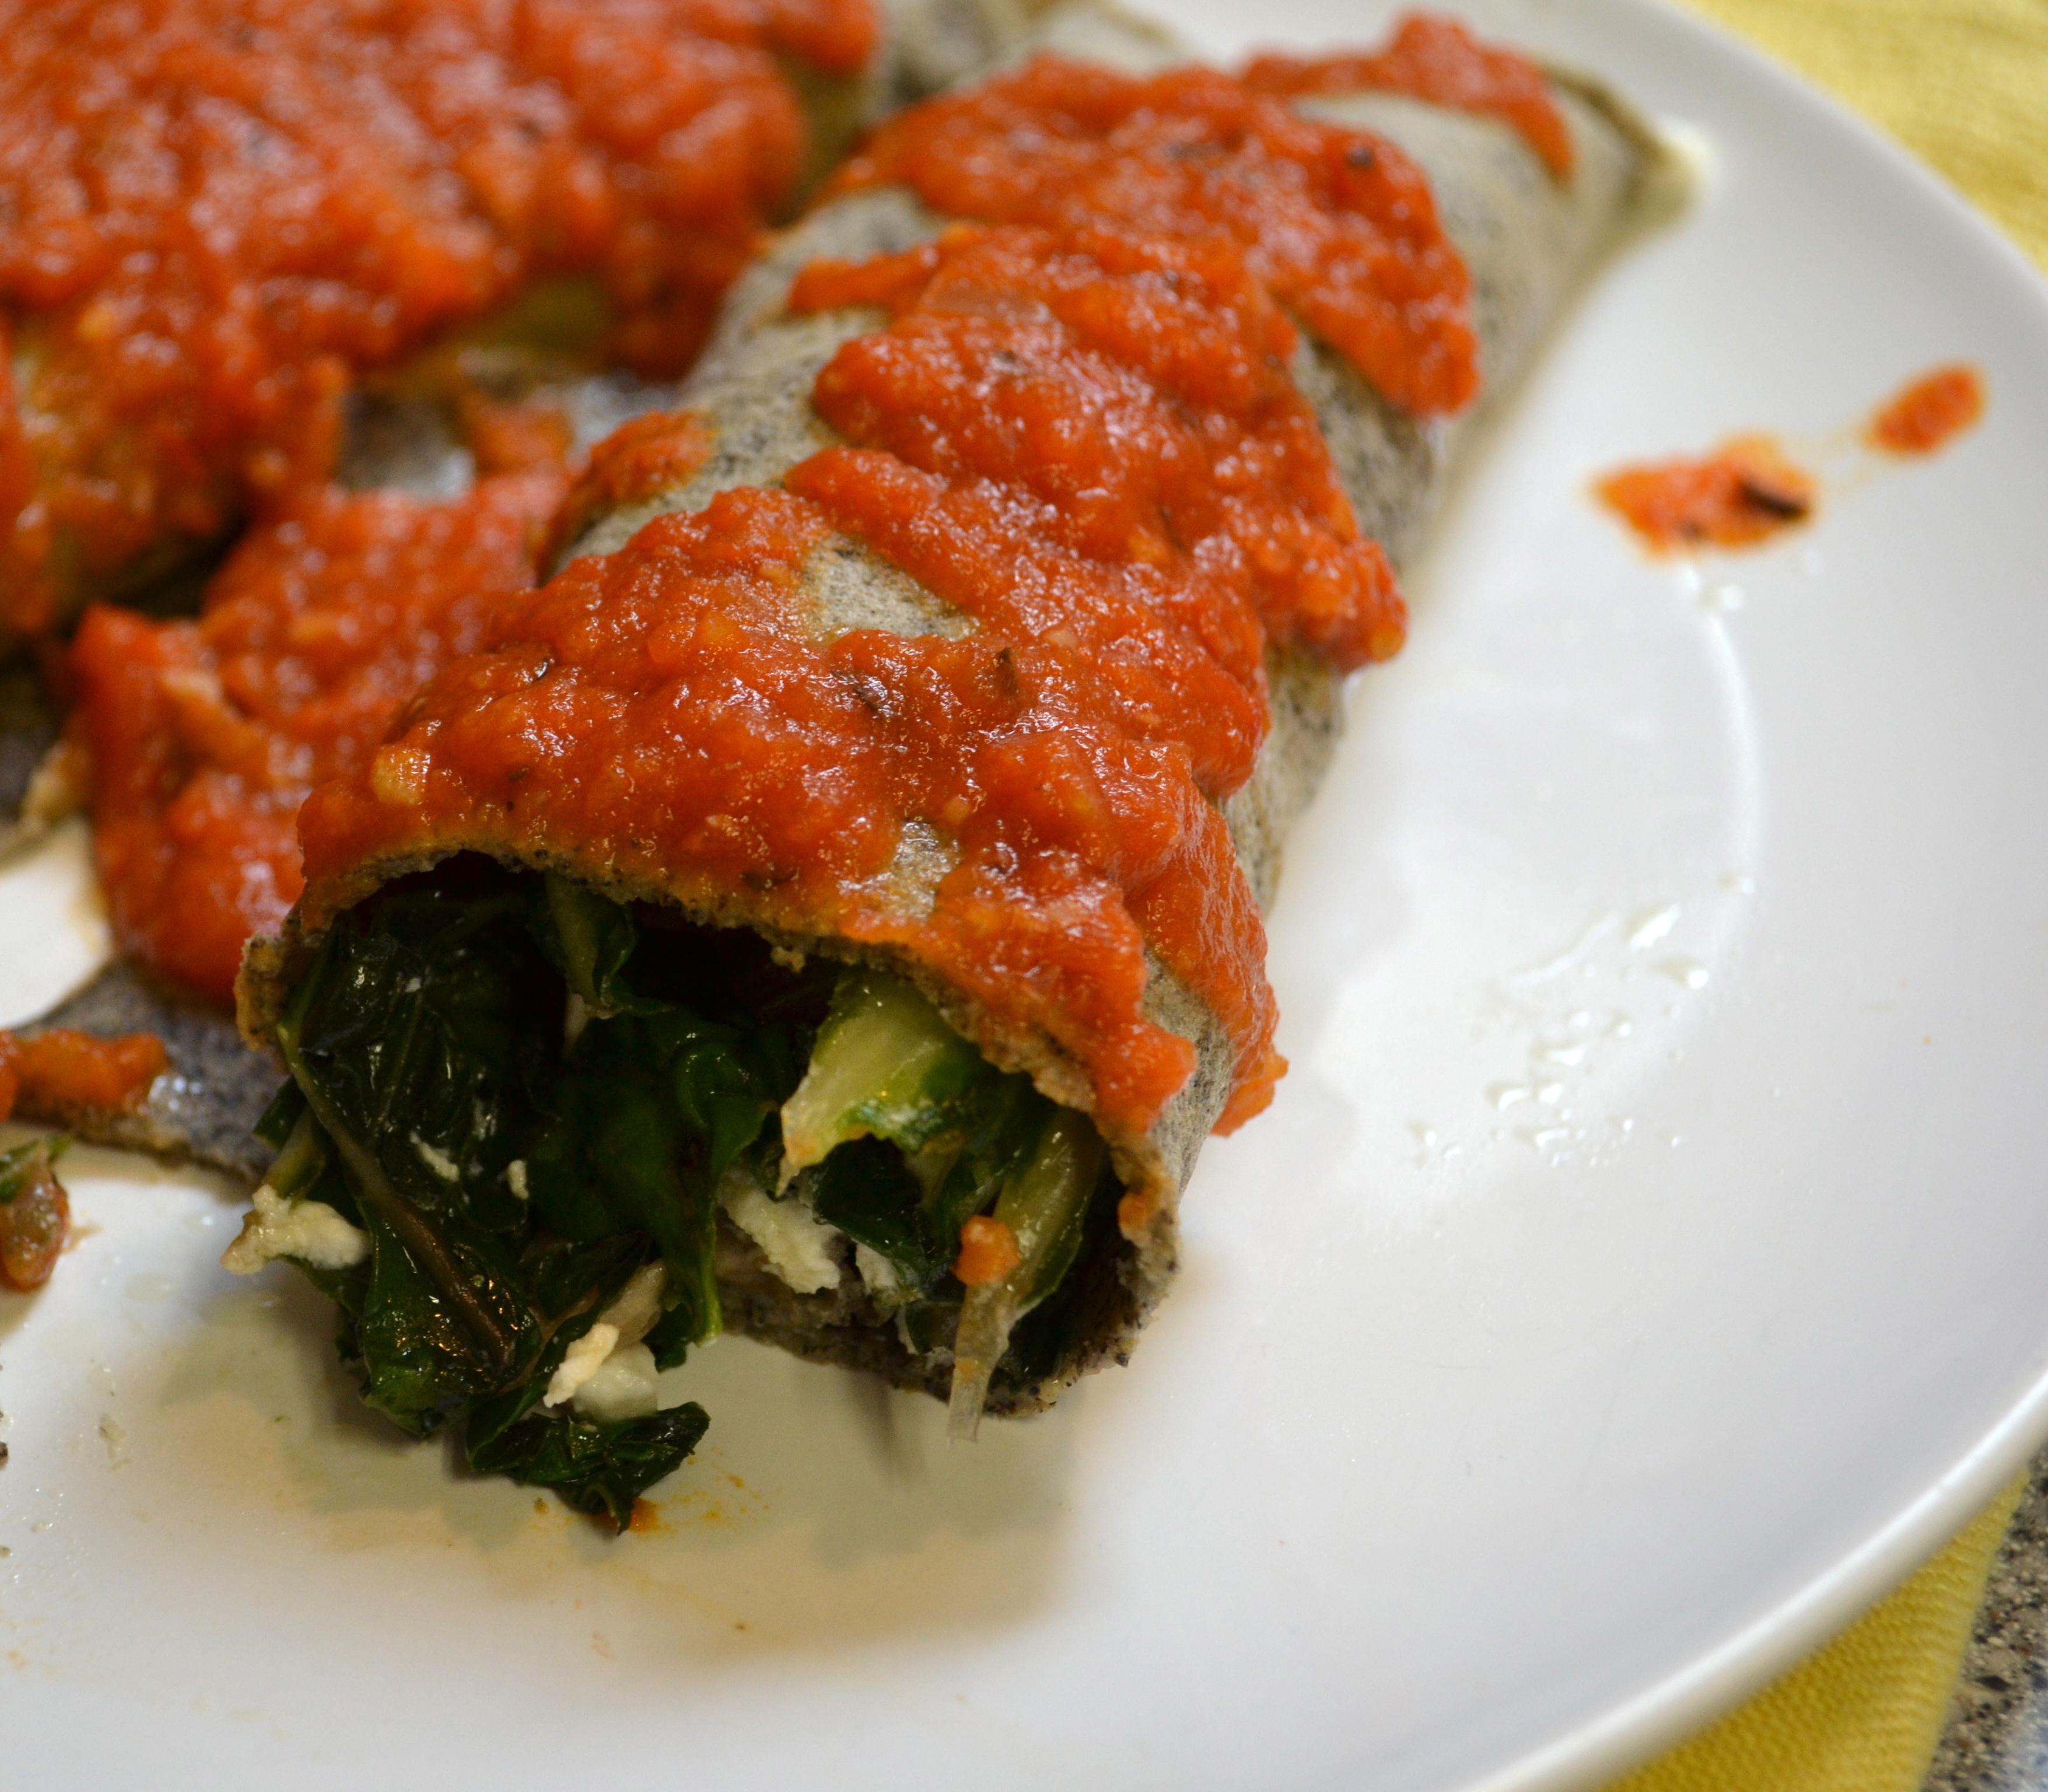 homemade tomato sauce | lushesfood